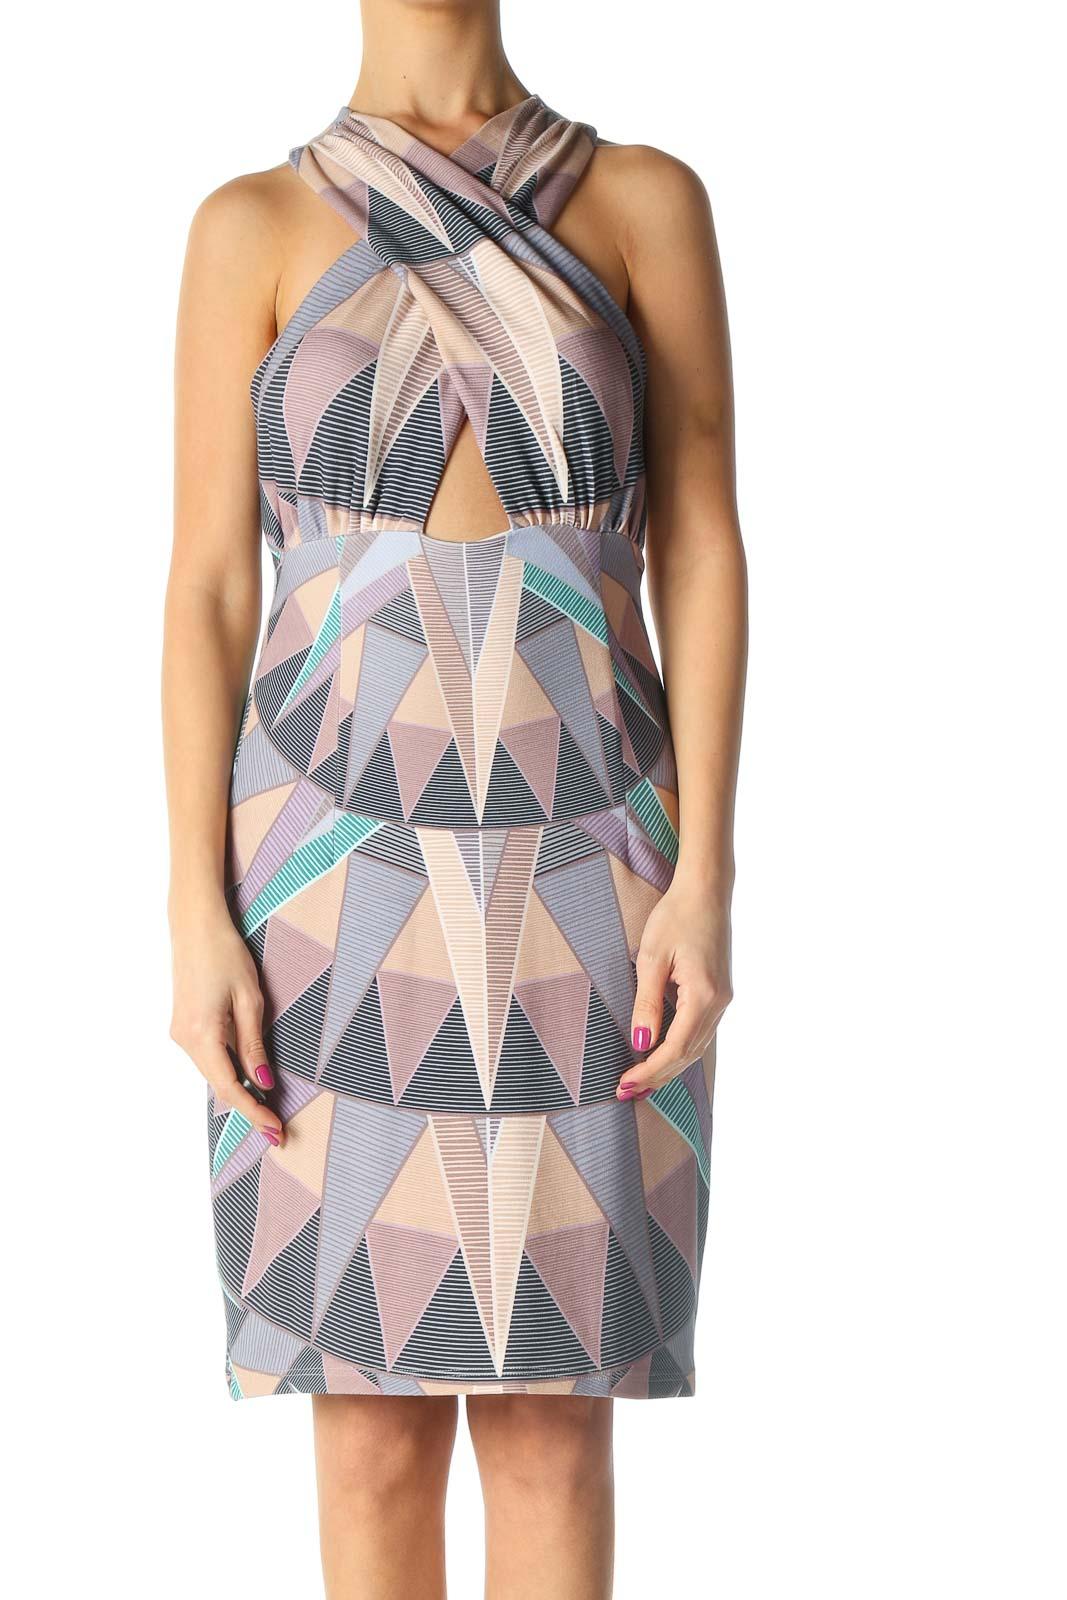 Beige Chic A-Line Dress Front